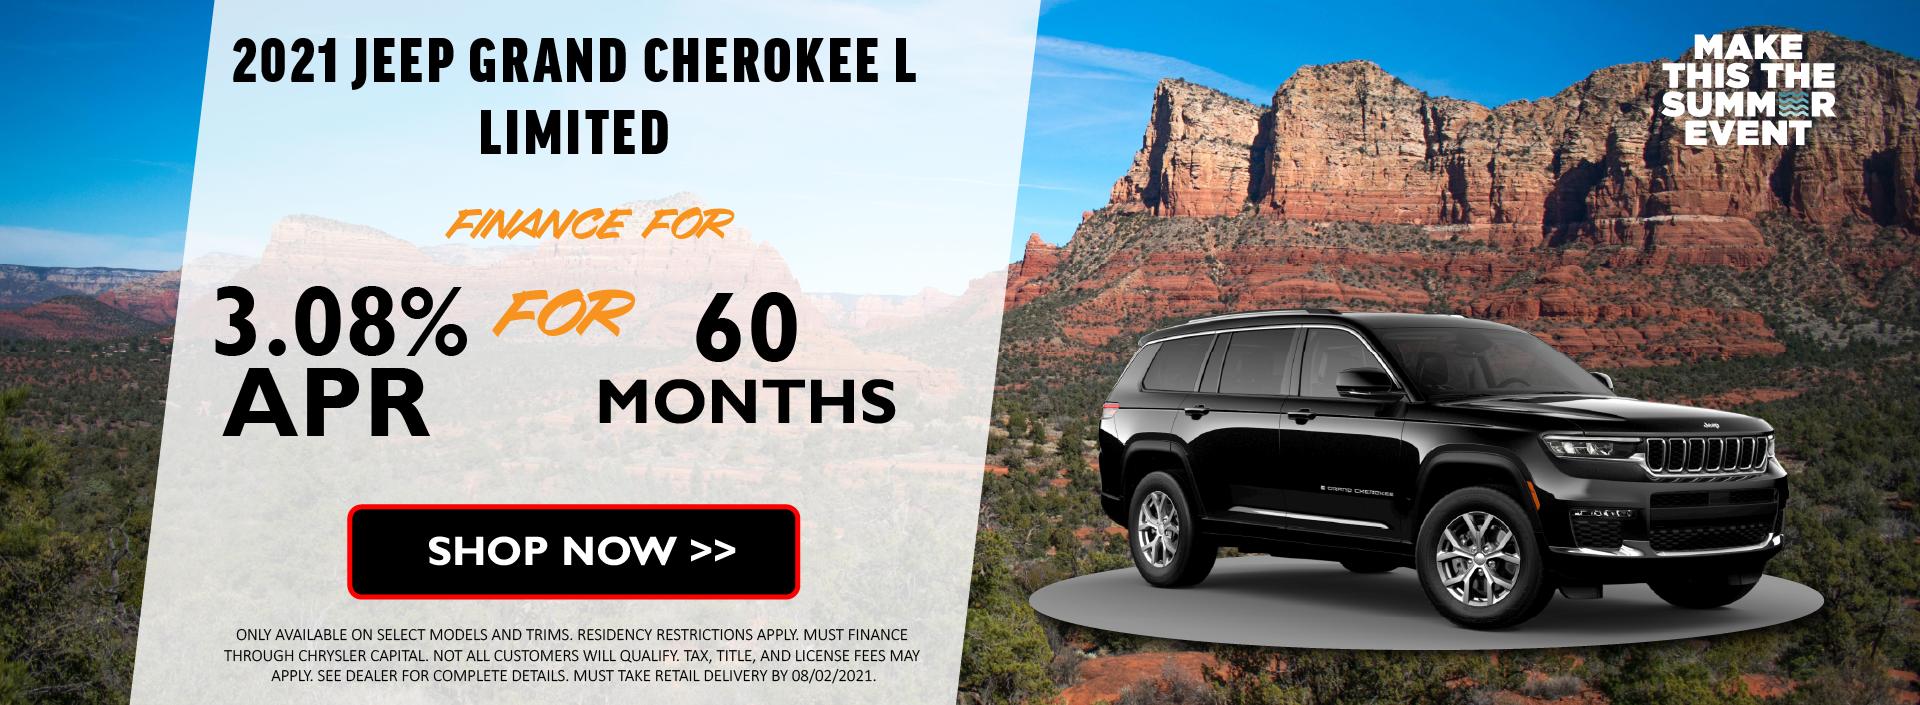 2021 Jeep Grand Cherokee July